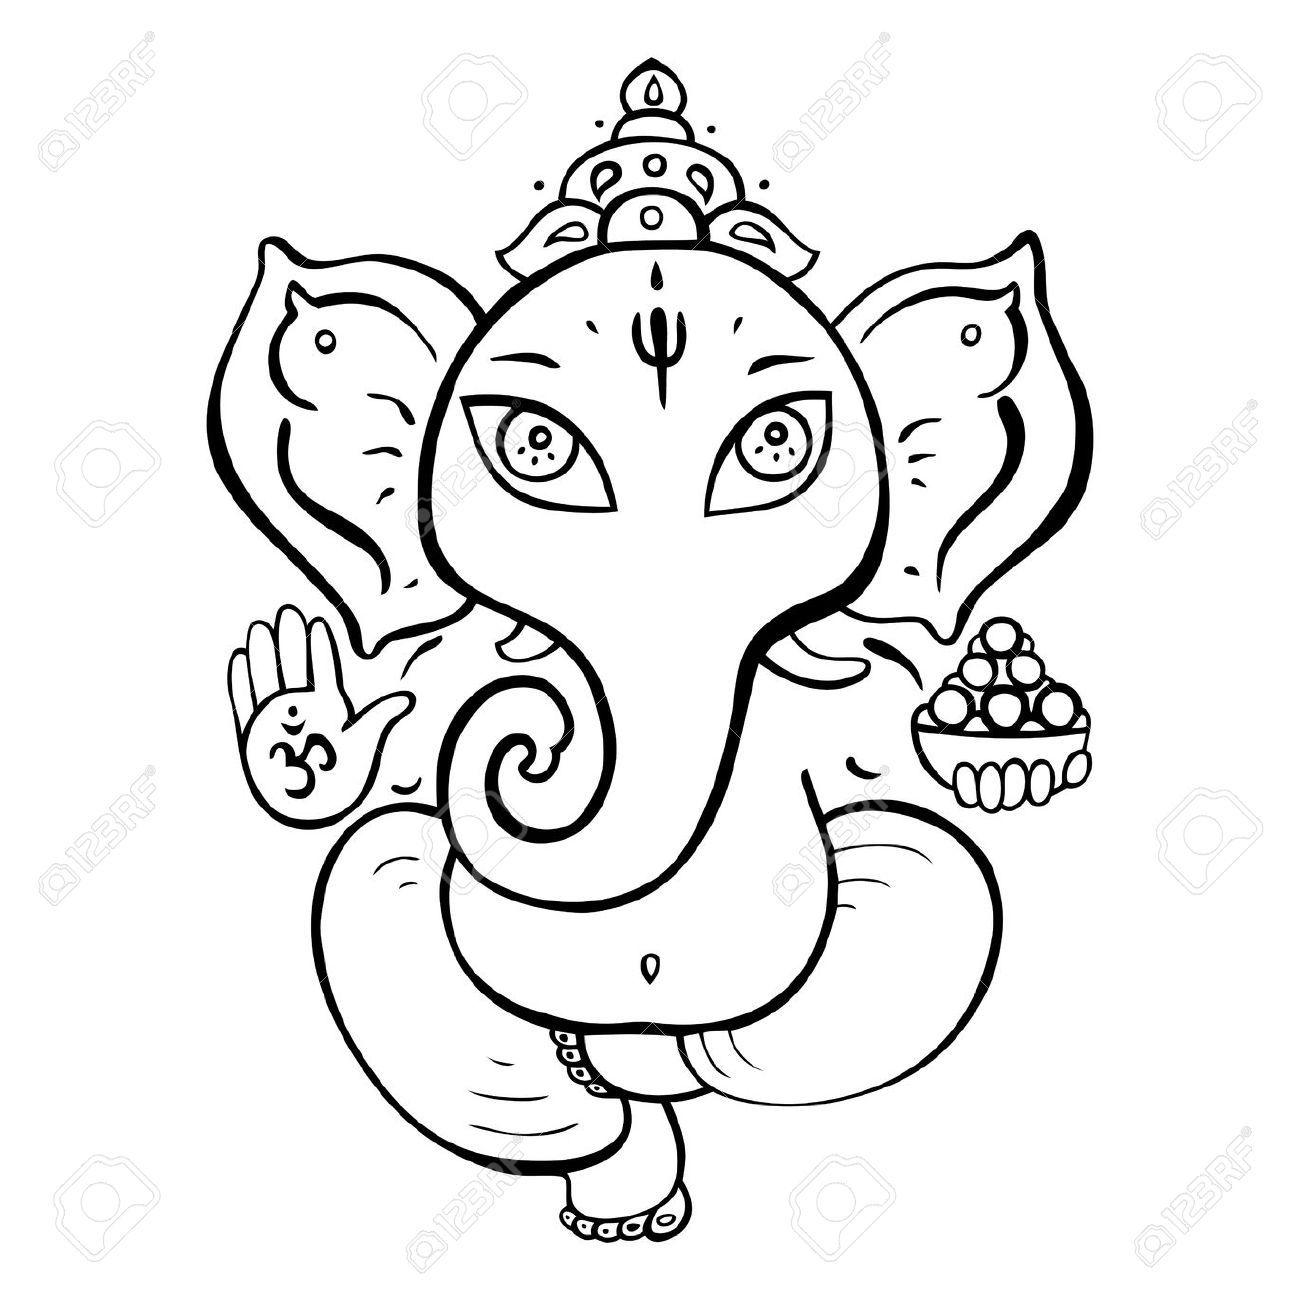 Pin de Vanessa Lamblin en elephants   Pinterest   Tatuajes, Buddha y ...